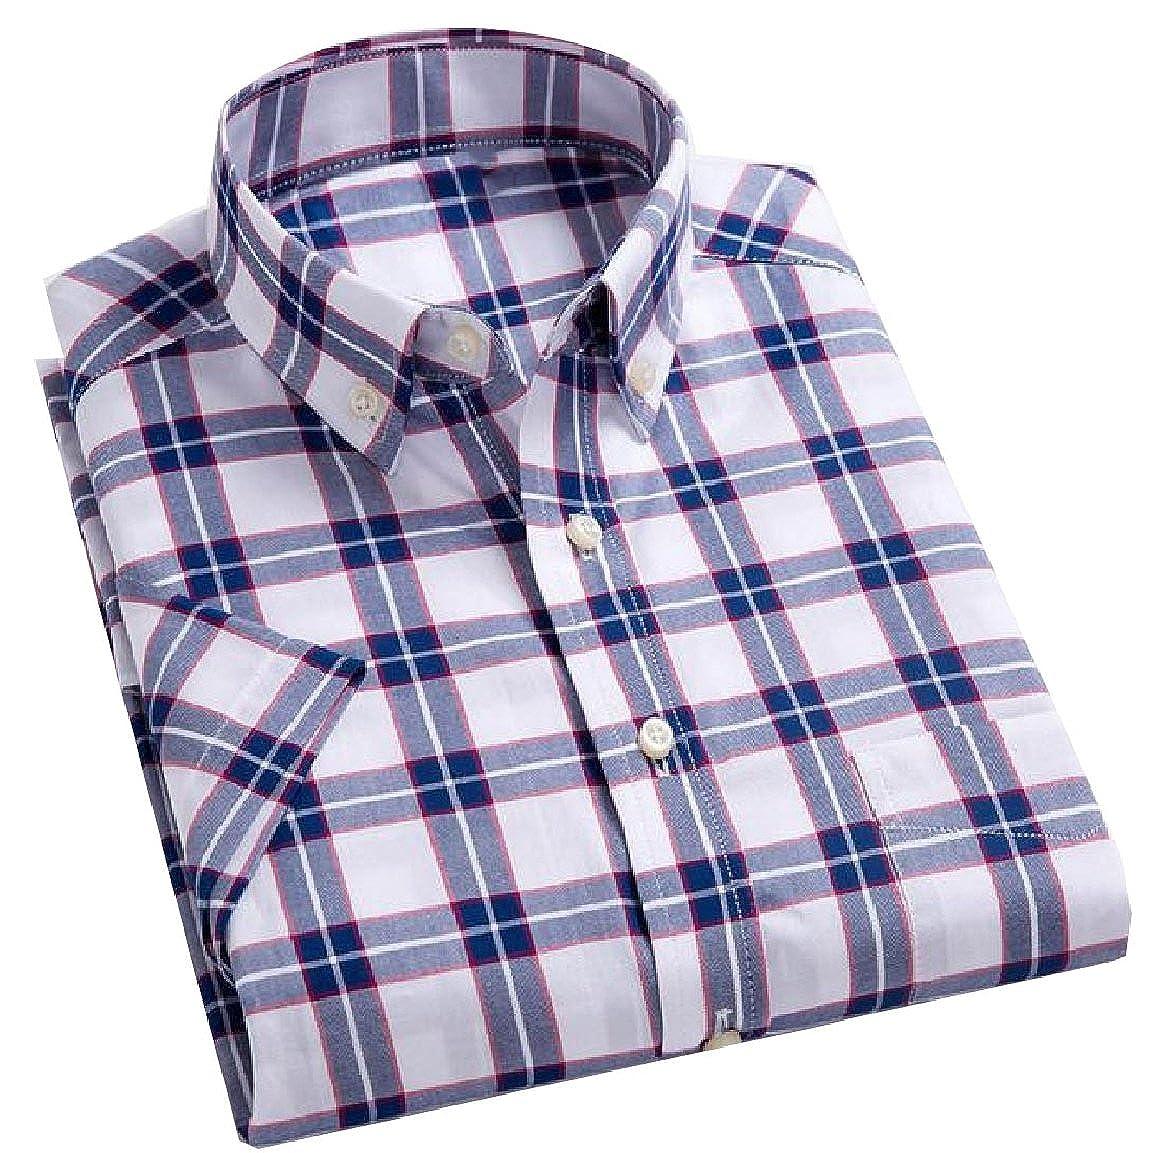 YUNY Mens Classic Plaid Summer Basic Cotton Short-Sleeve Casual Shirt 1 M